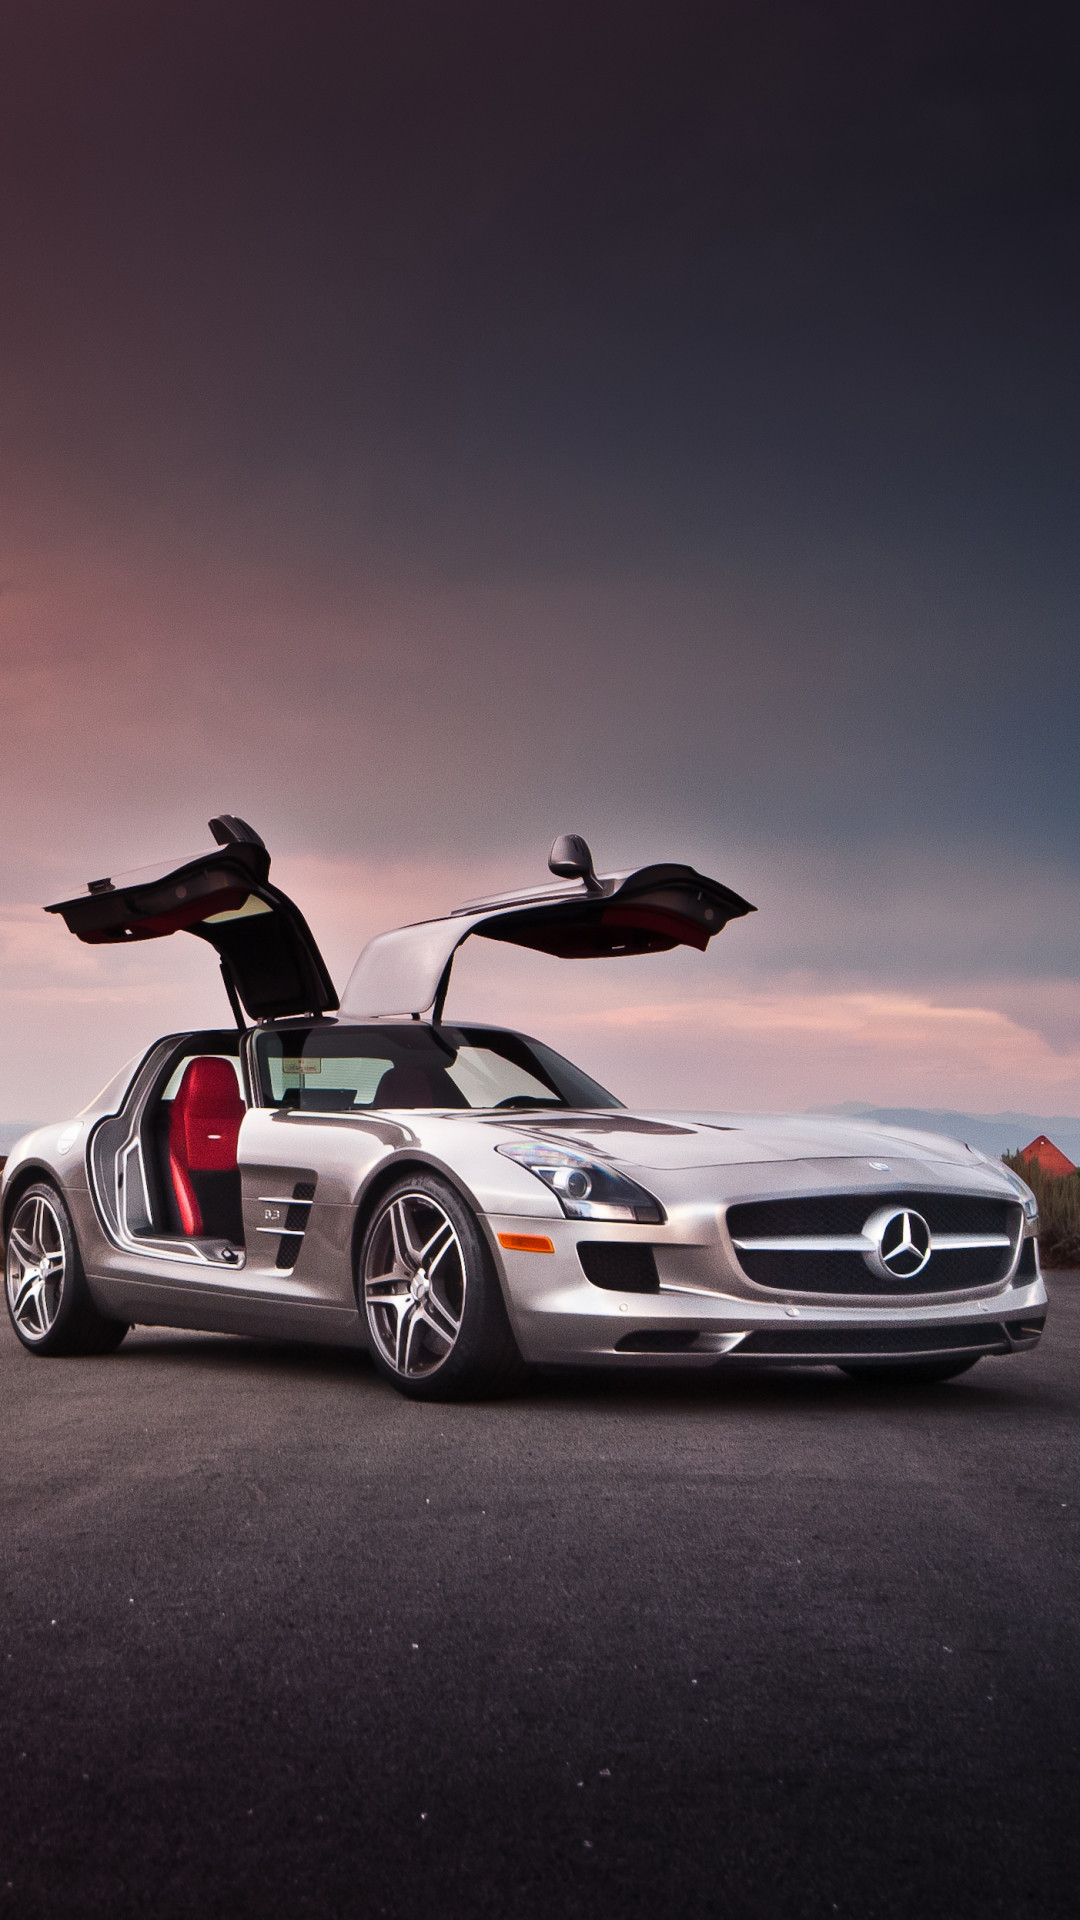 Mercedes Benz SLS Amg Wallpapers 74 images 1080x1920